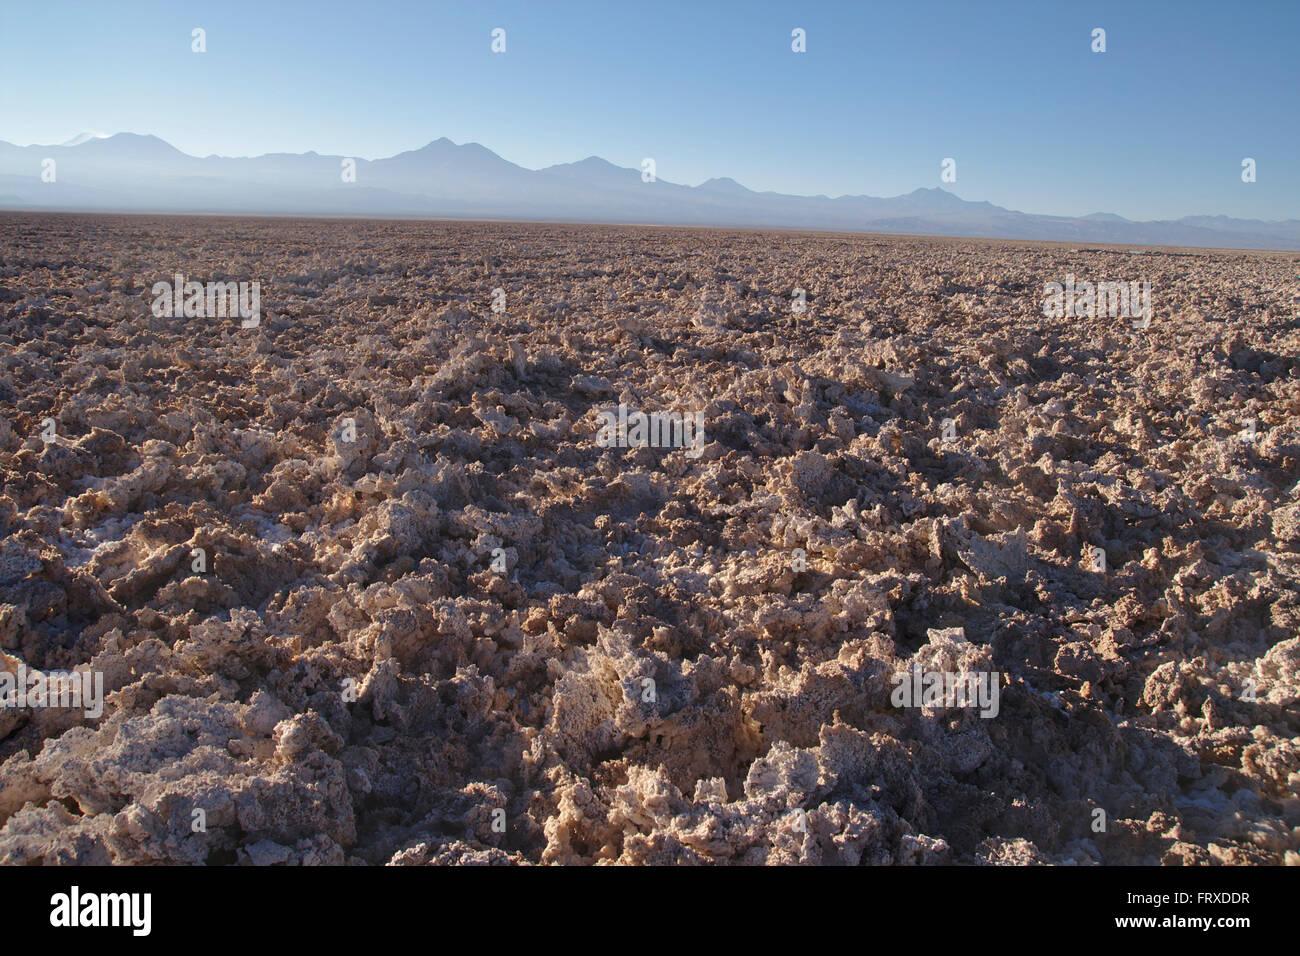 Salar de Atacama, Andes in Background, Chile - Stock Image